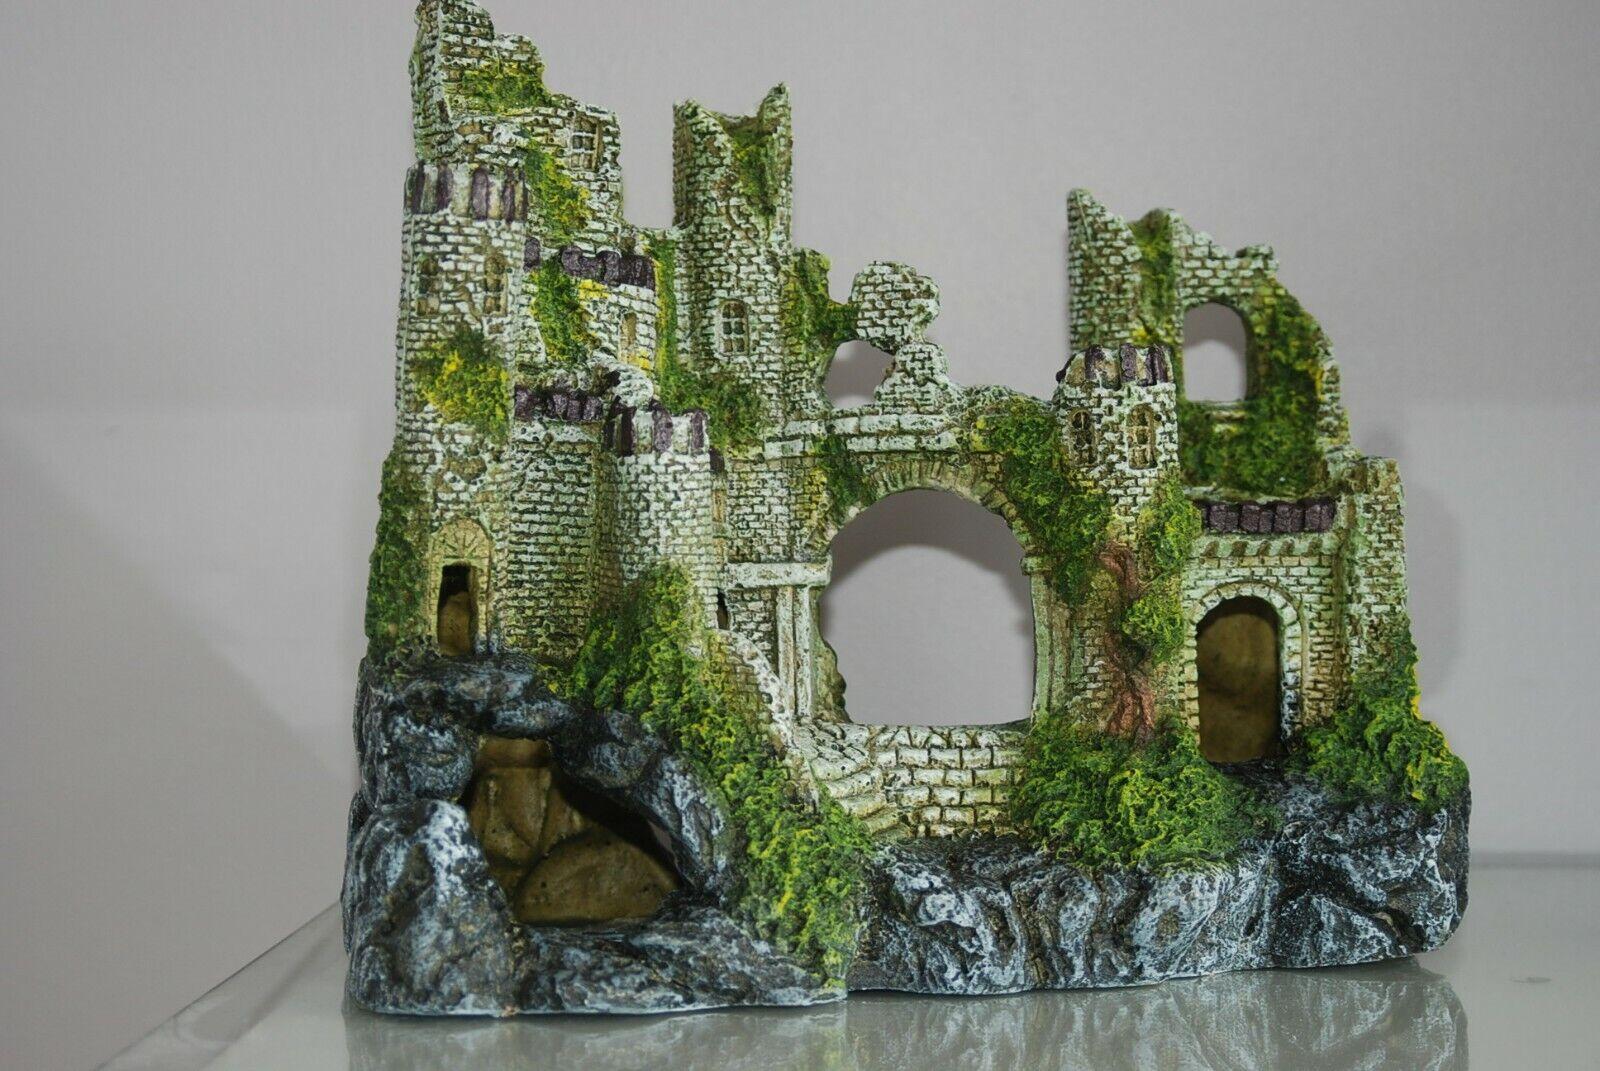 Atemberaubend Groß Alt Ruine Alter Burg Ruine 30 X 25 X 13 CM